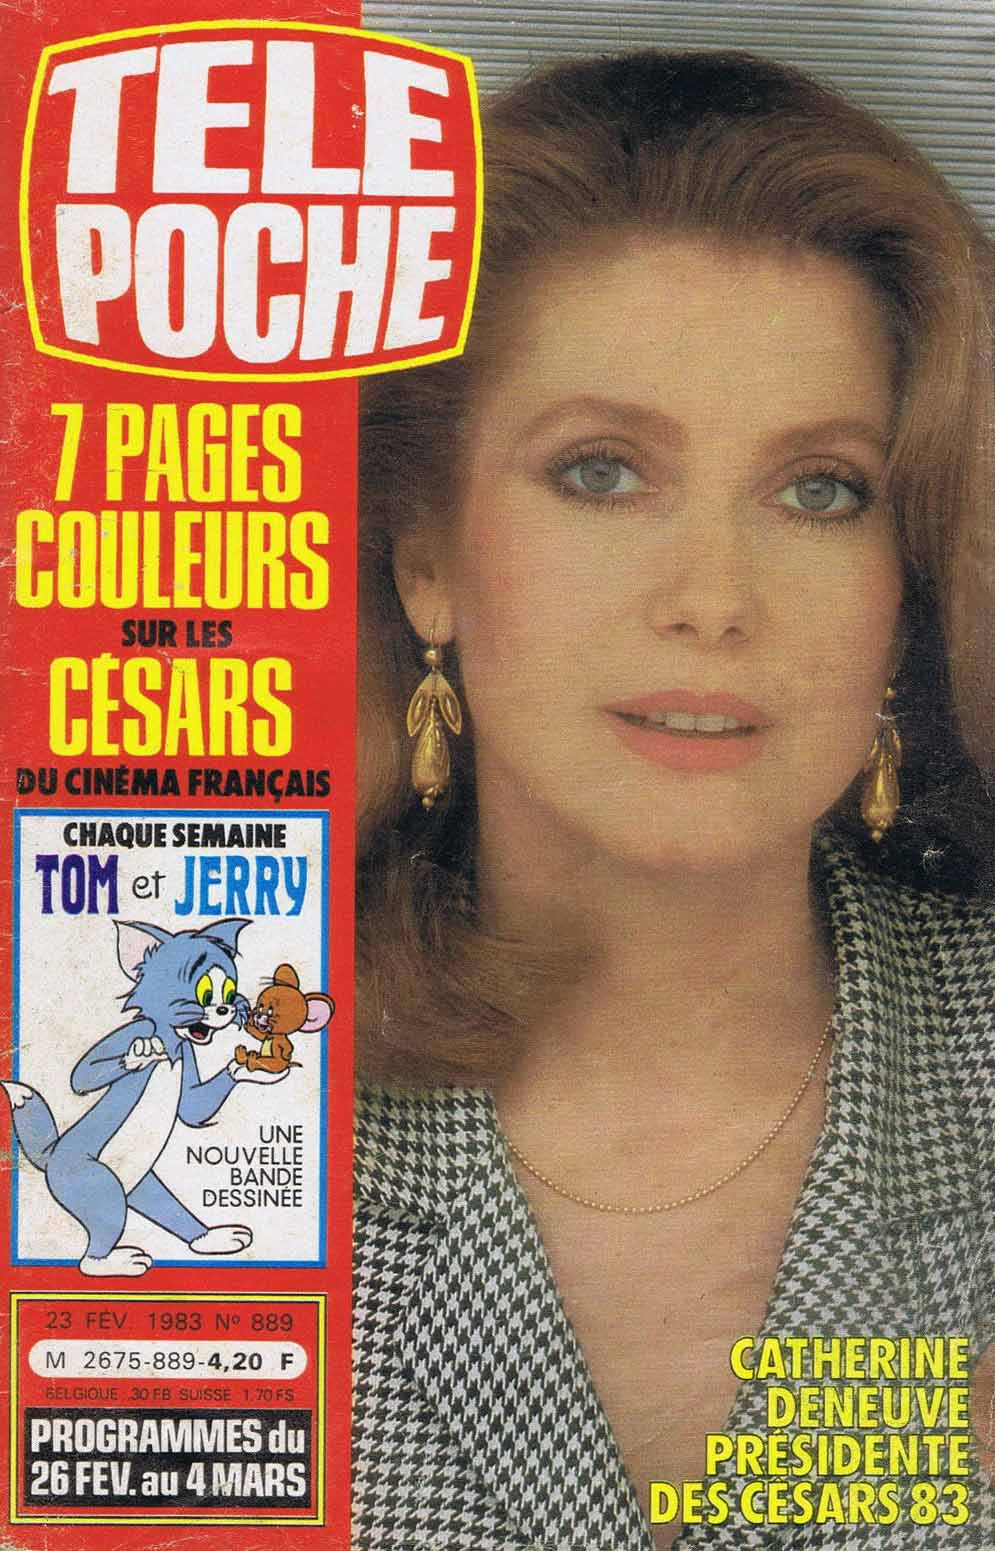 26 février au 4 mars 1983